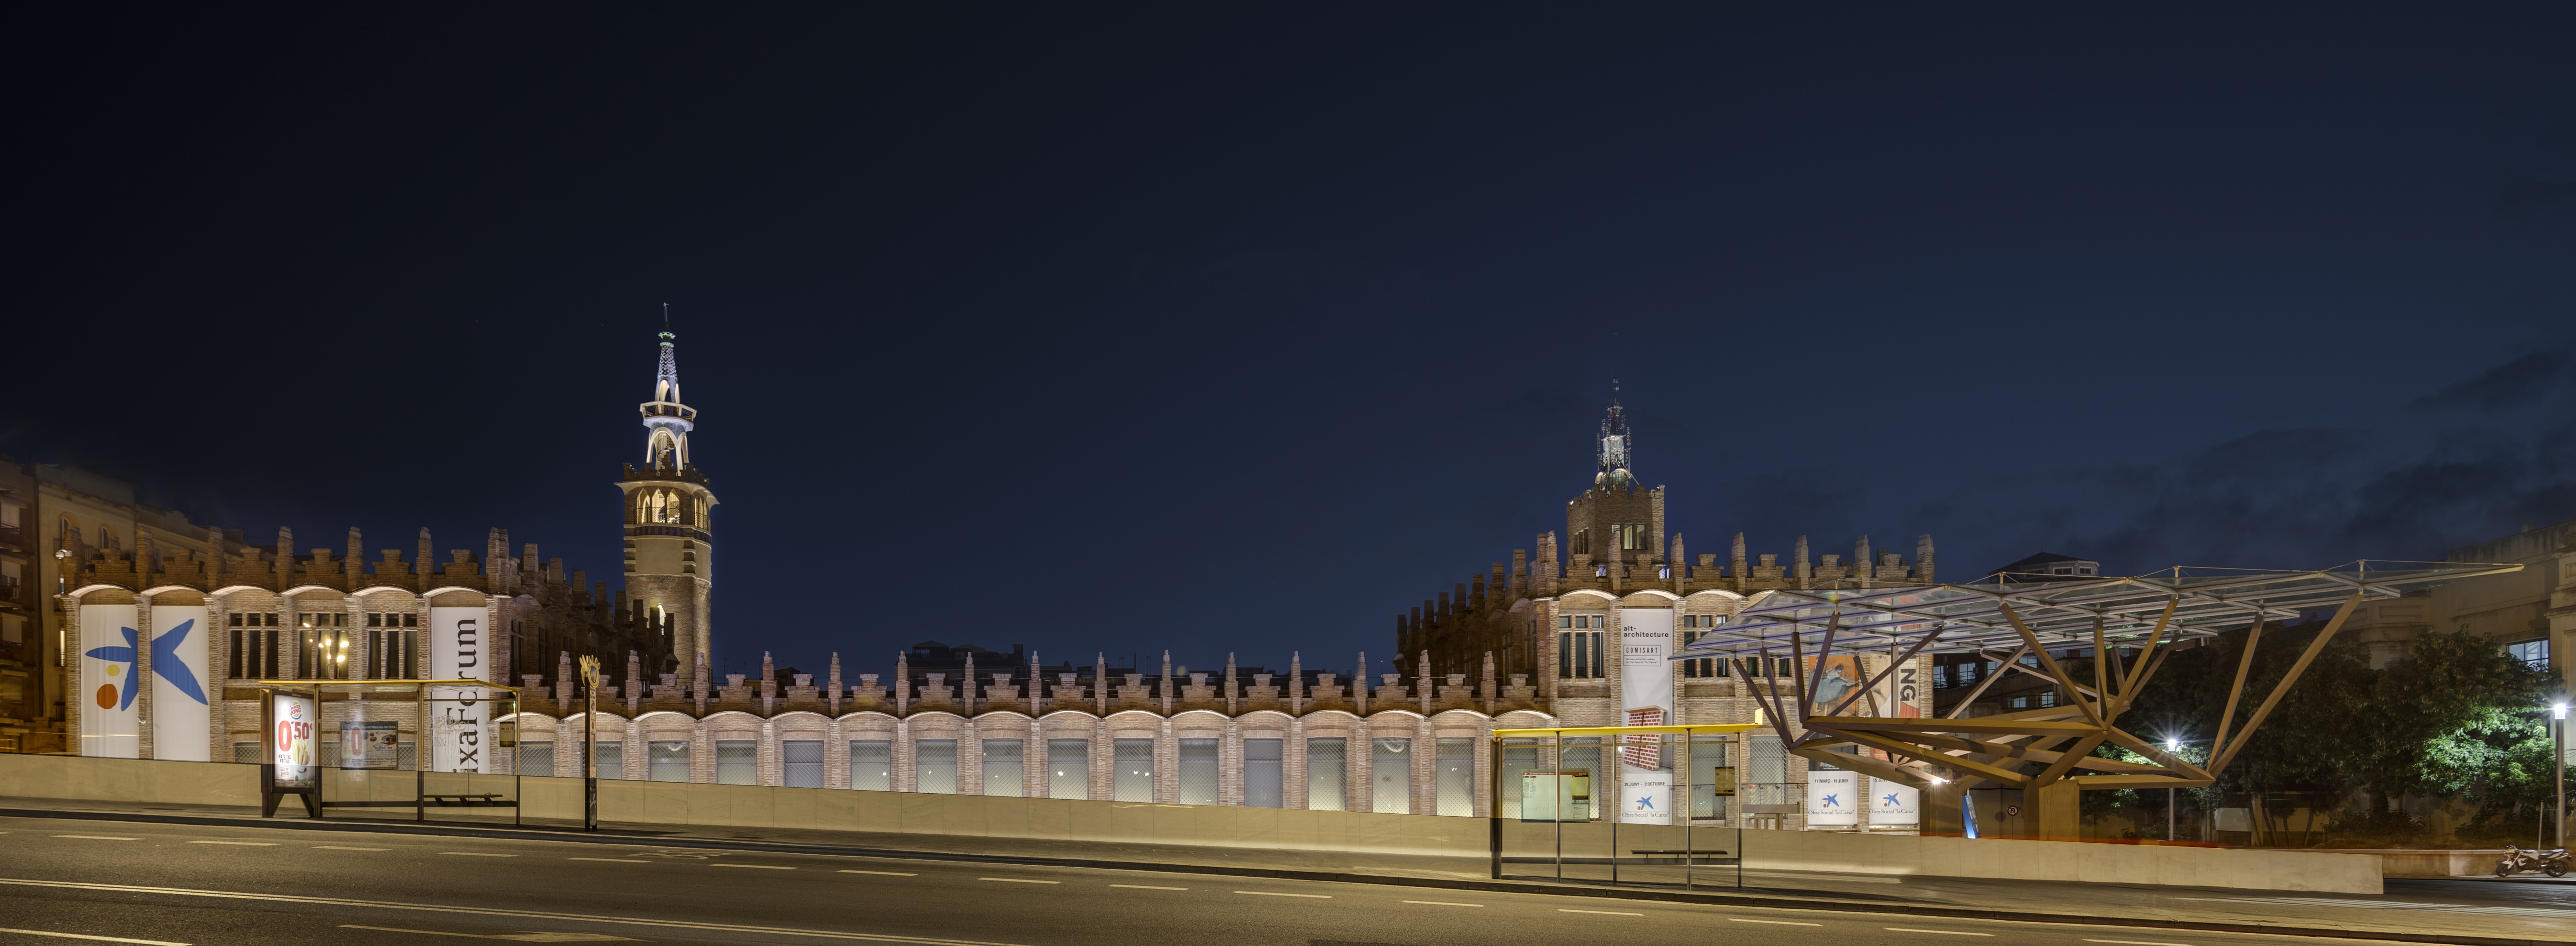 Caixa forum Barcelona